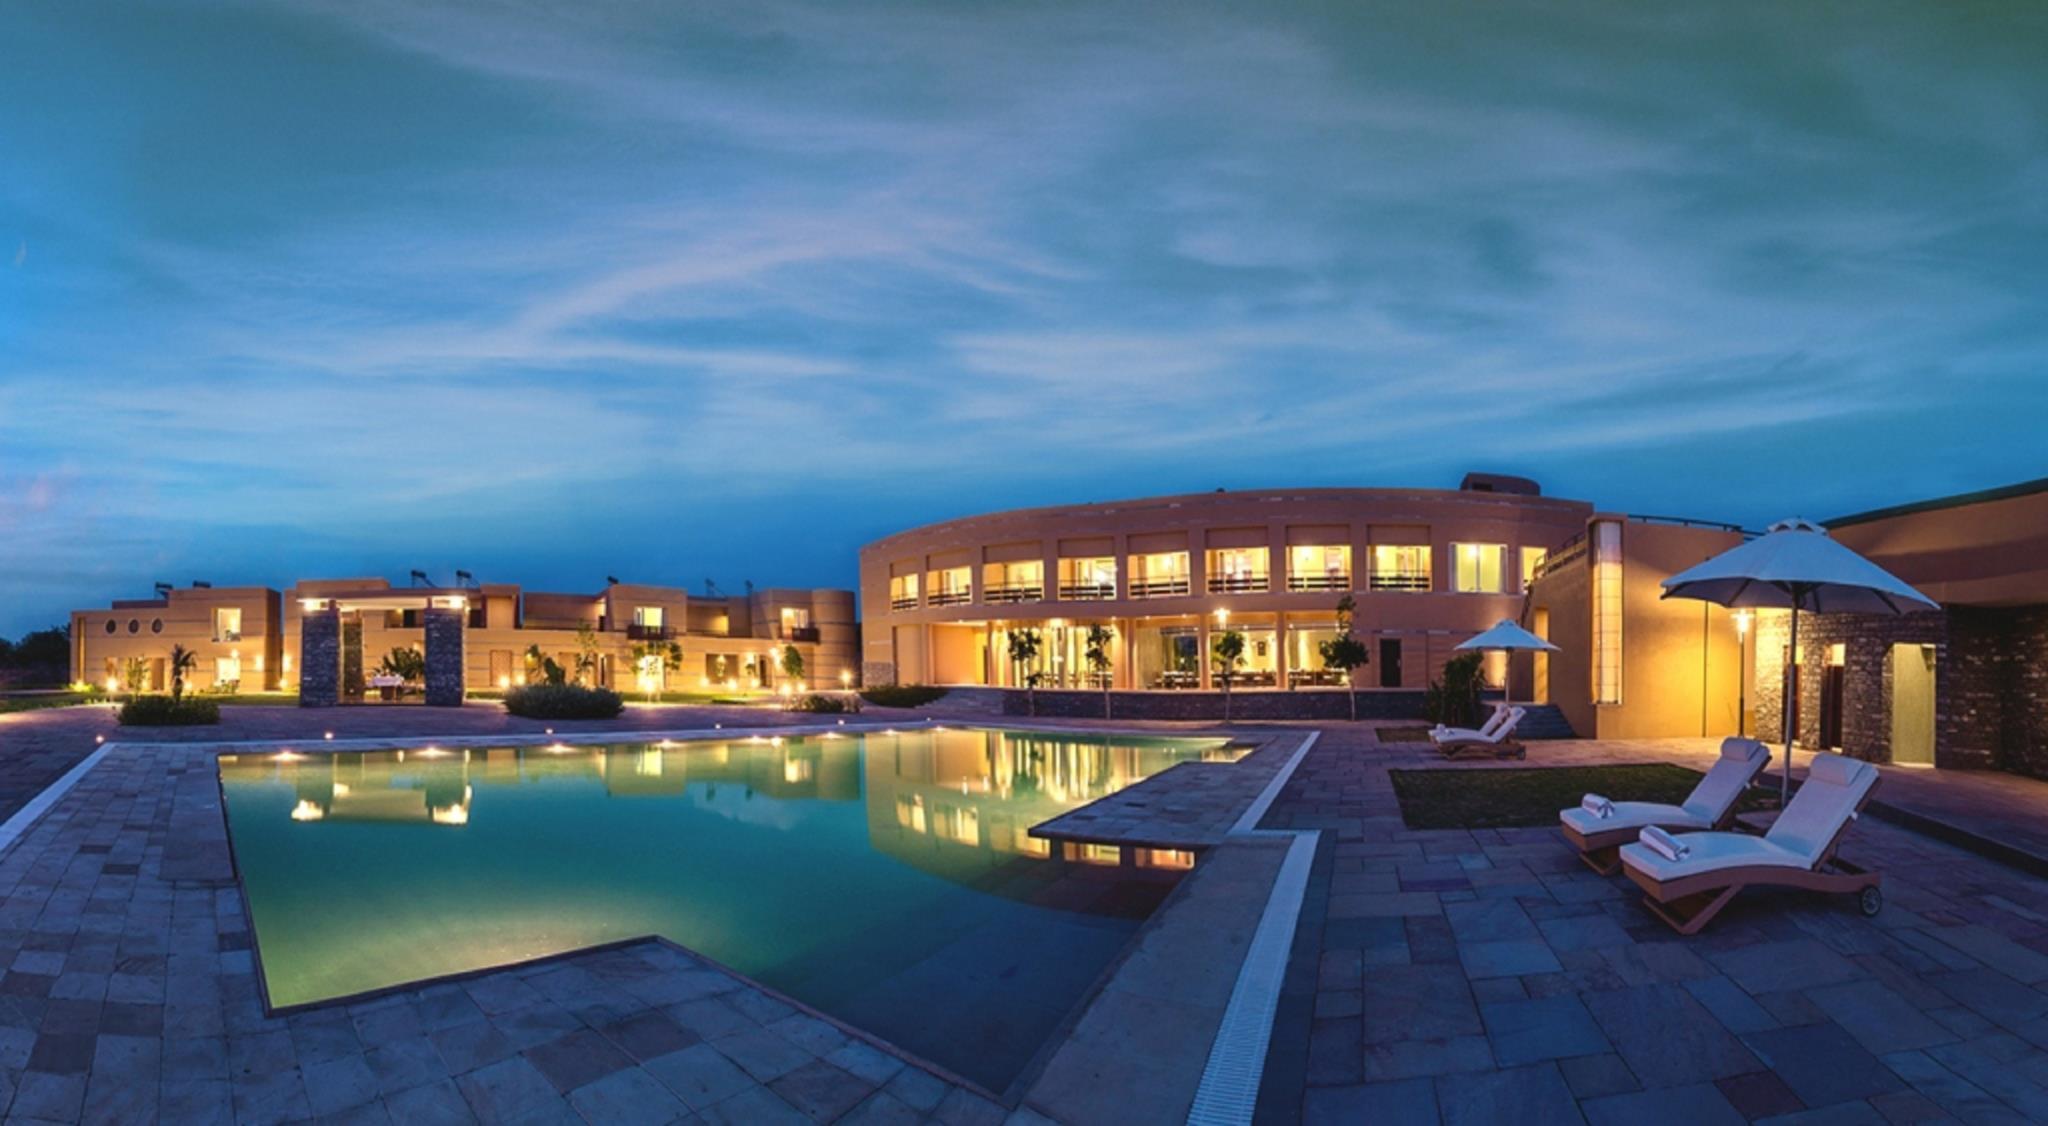 Dera Masuda Luxury Resort